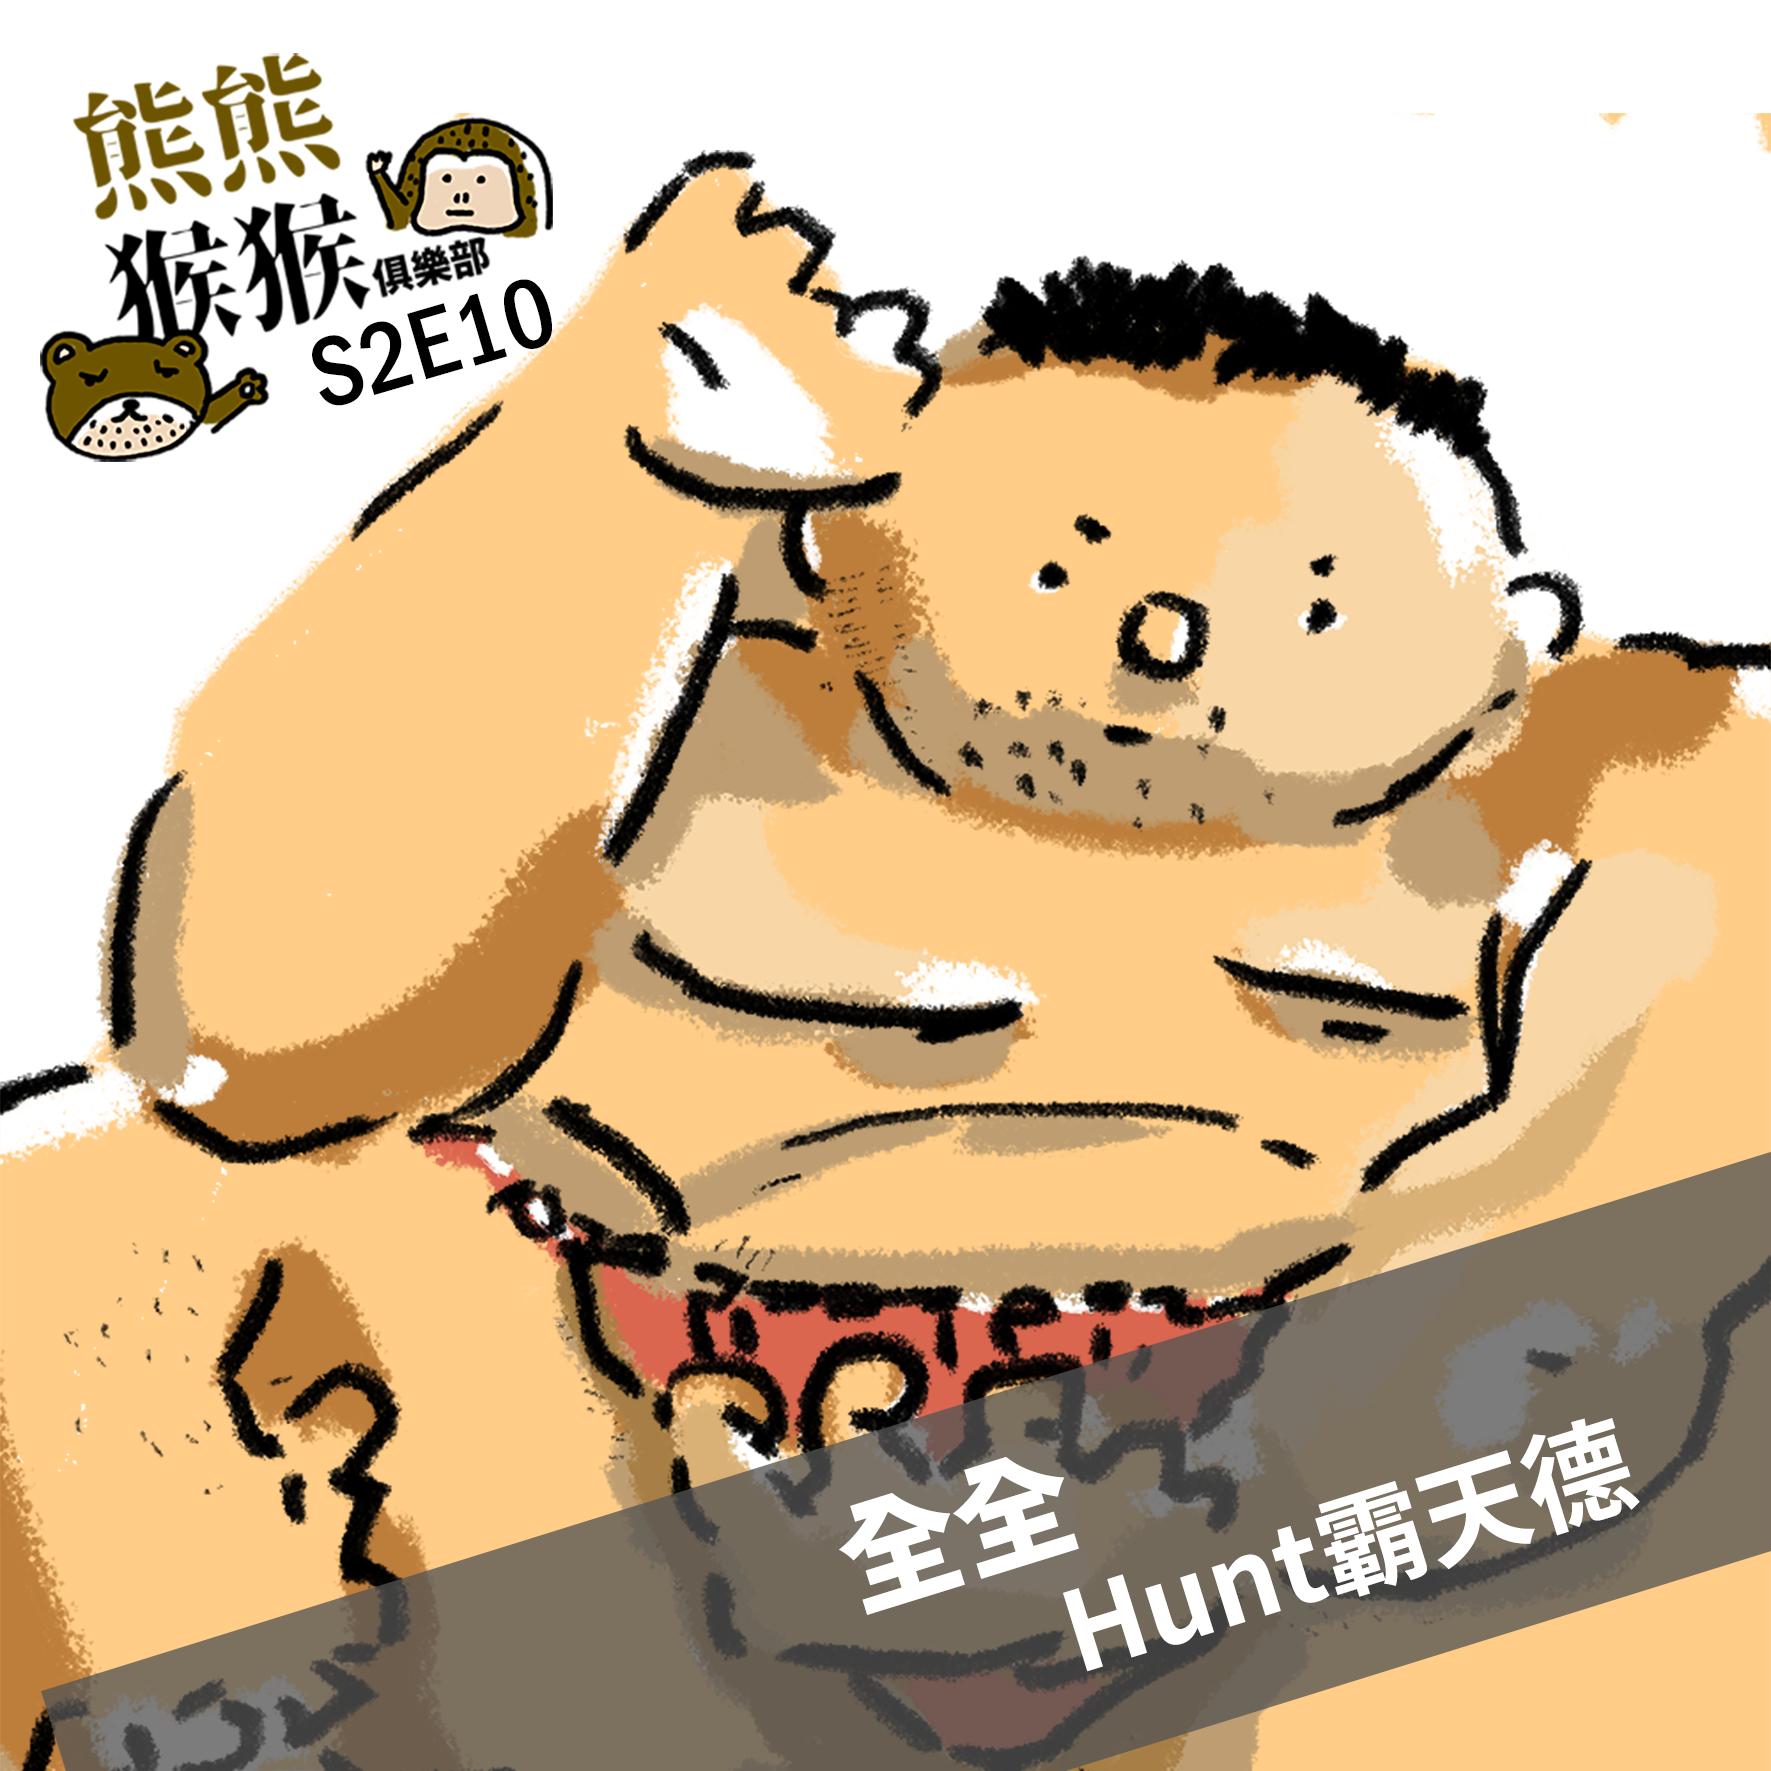 EP10 🐻🐵  十全十美EP.10  六尺趴大揭秘~!同志夜店怎麼玩? feat. Hunt霸天德 全全